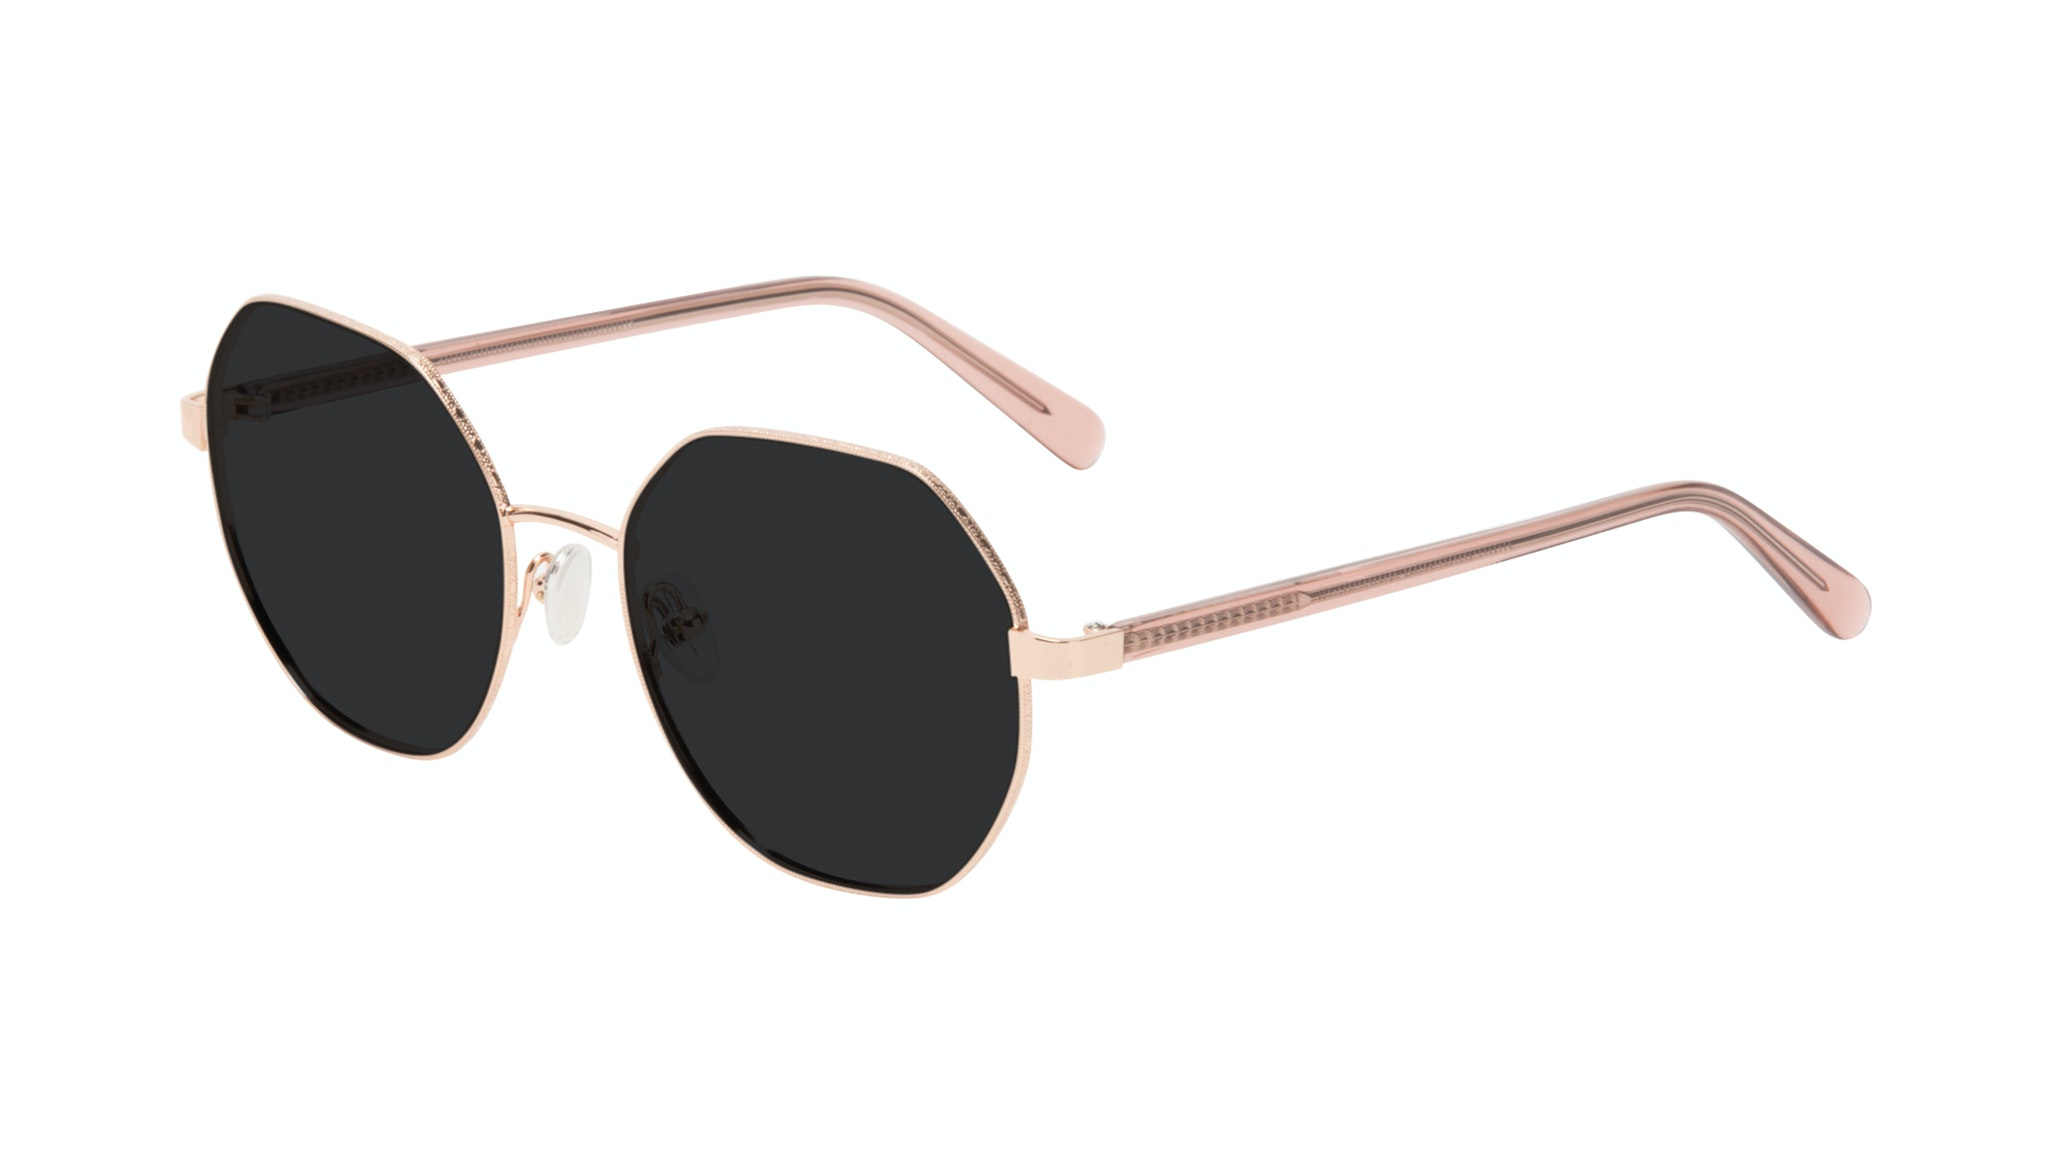 Affordable Fashion Glasses Round Sunglasses Women Fantasy Rose Tilt